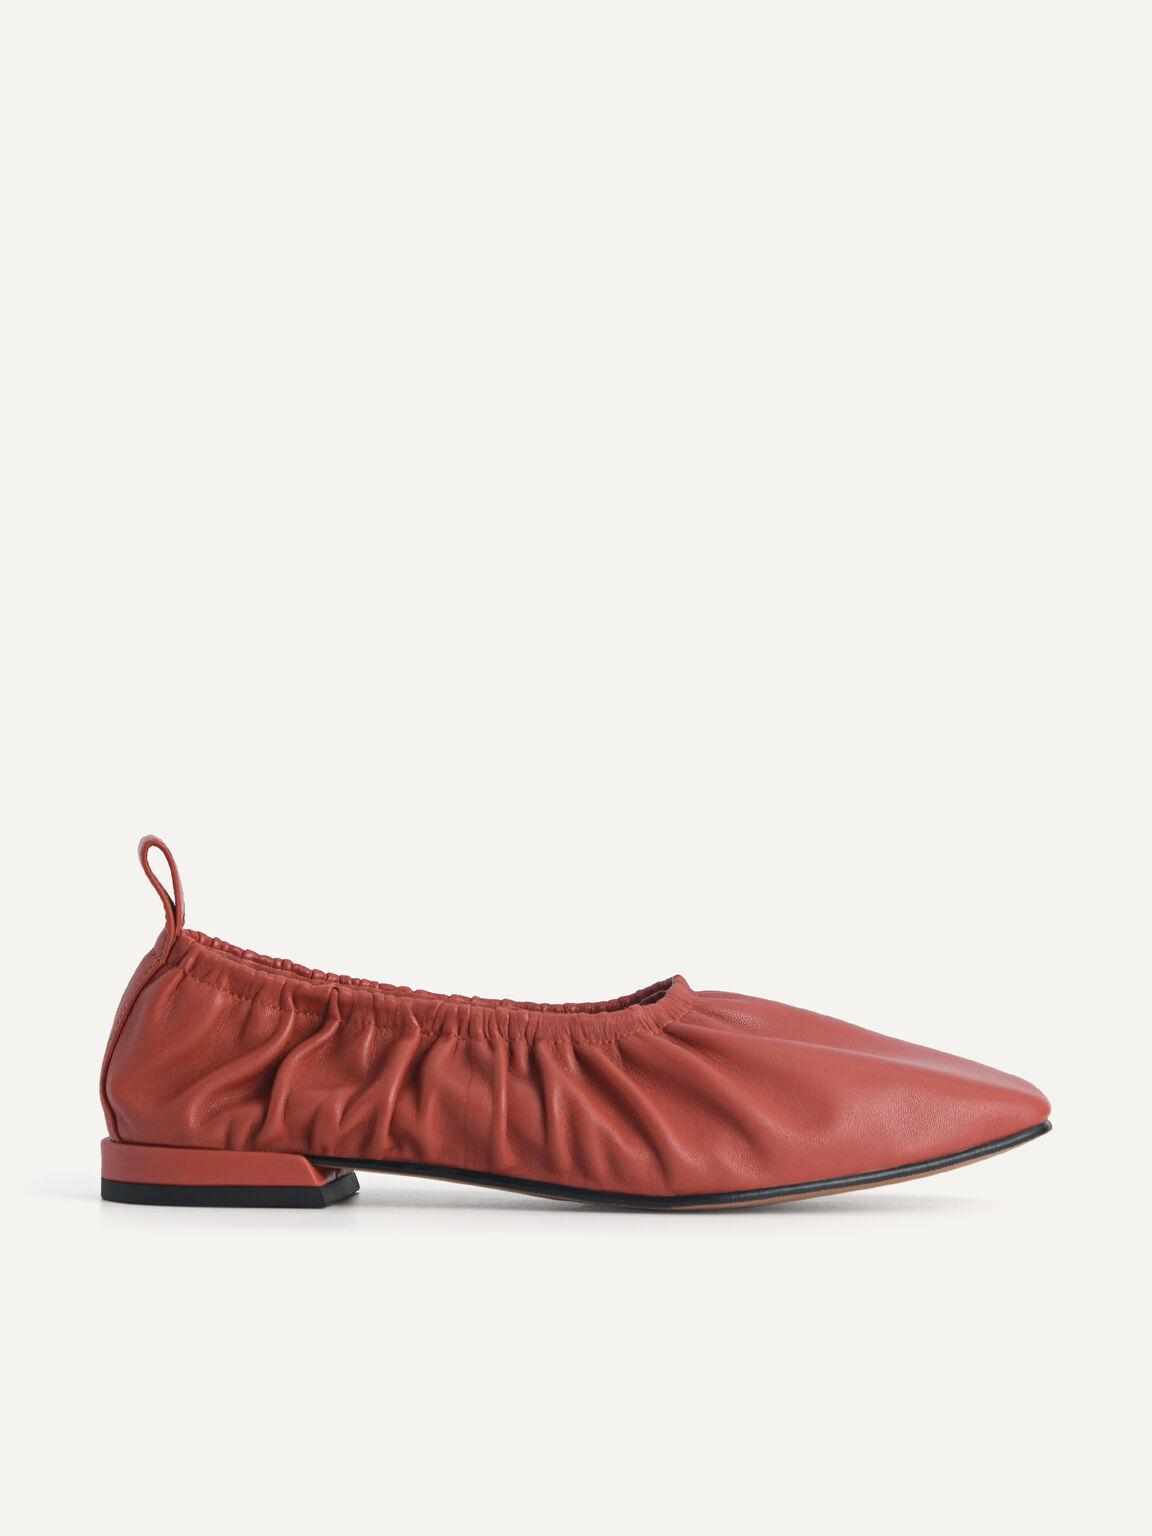 Ruched Leather Flats, Brick, hi-res